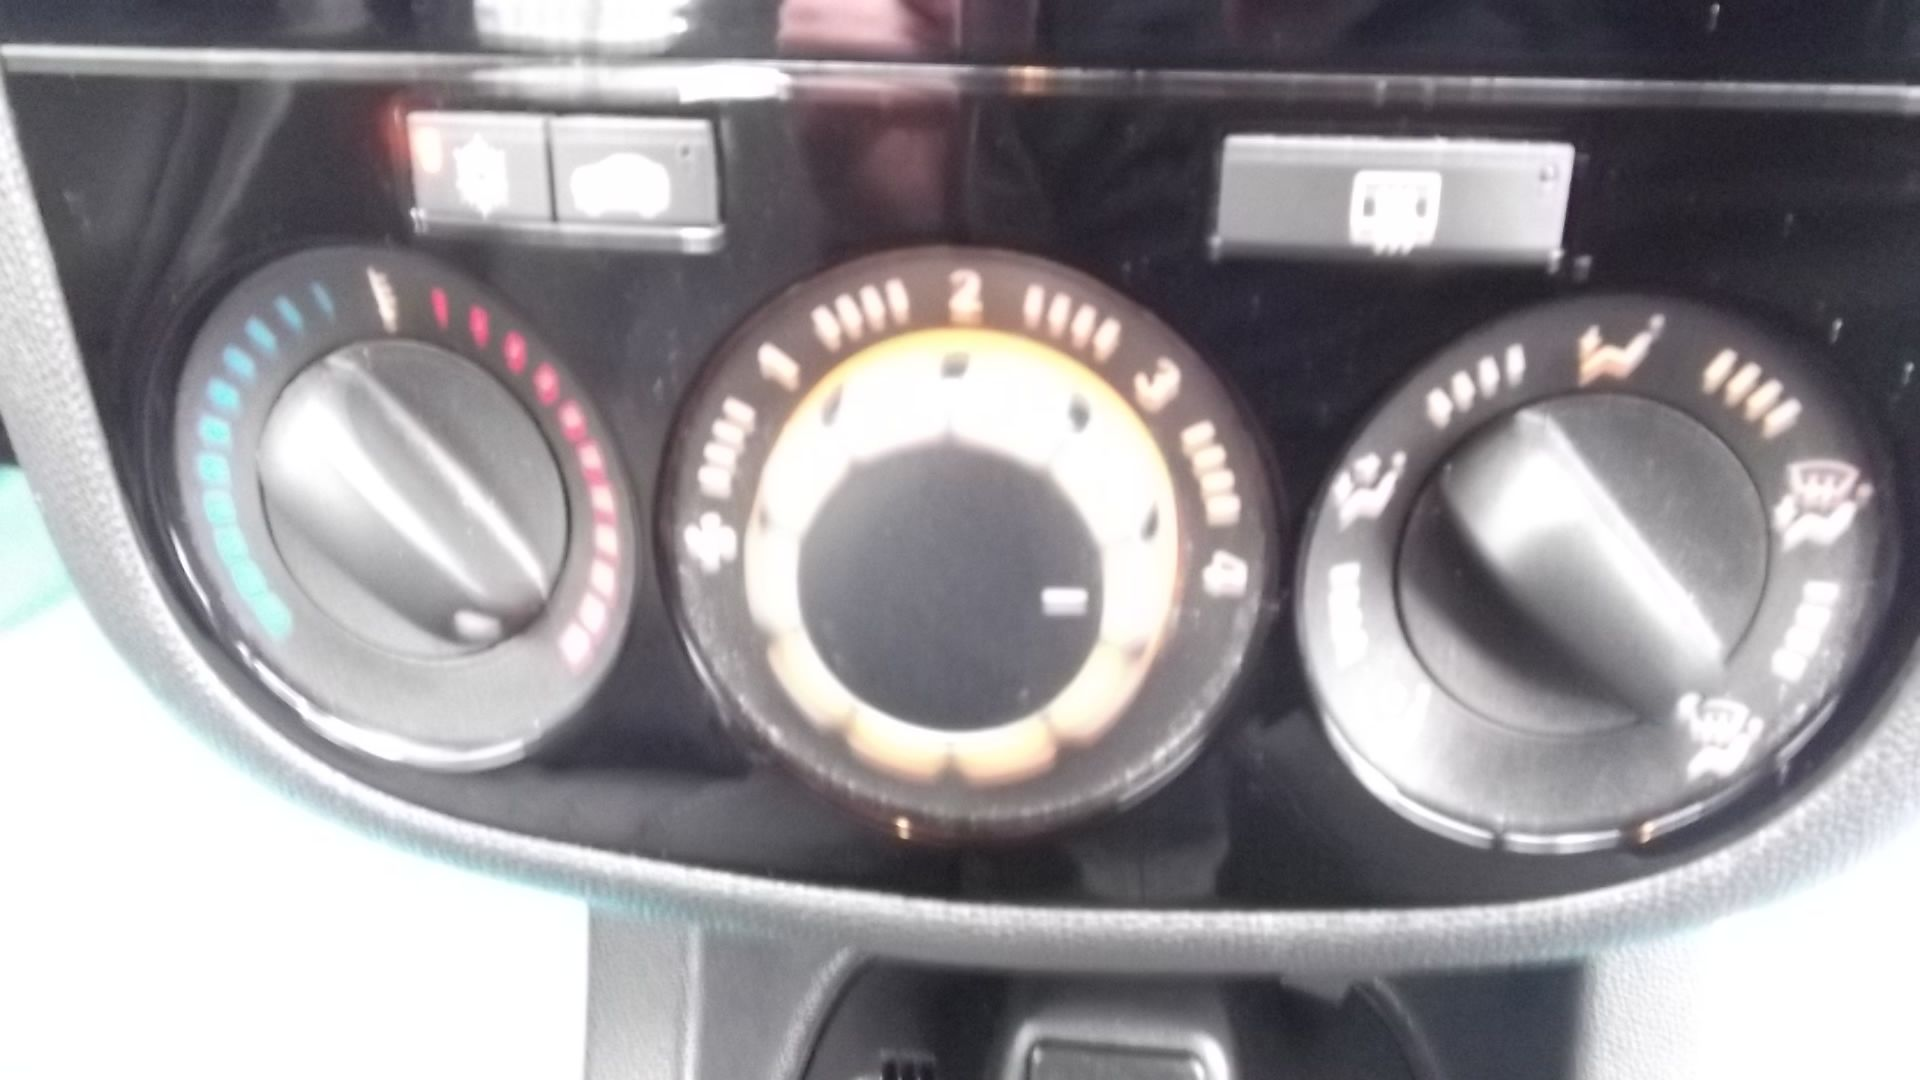 2014 Vauxhall Corsa Se 5Dr Hatchback - Full Service History - CL505 - NO VAT ON THE HAMMER - - Image 5 of 24